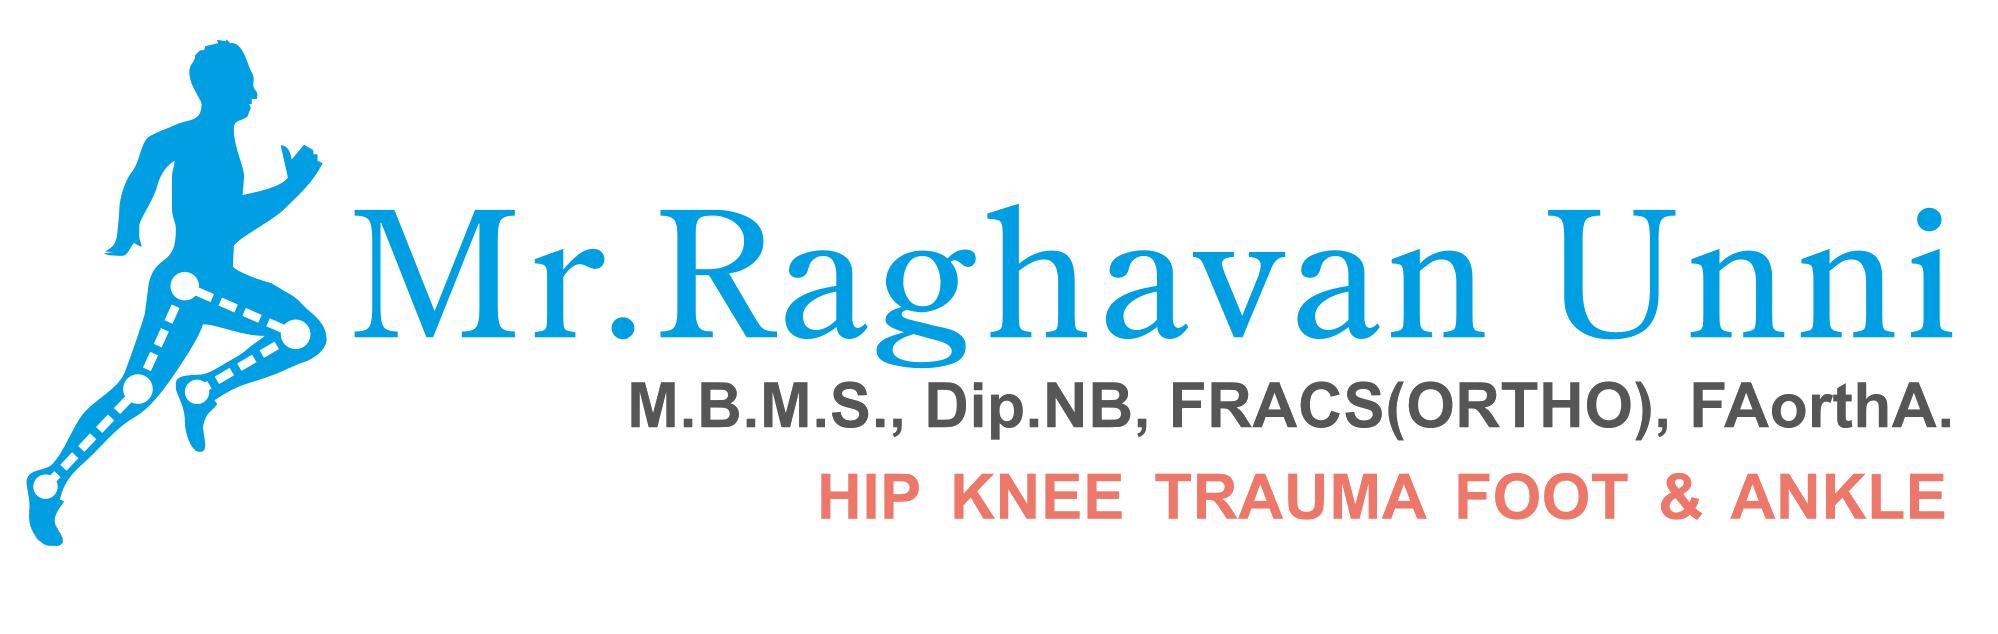 Mr Raghavan Unni